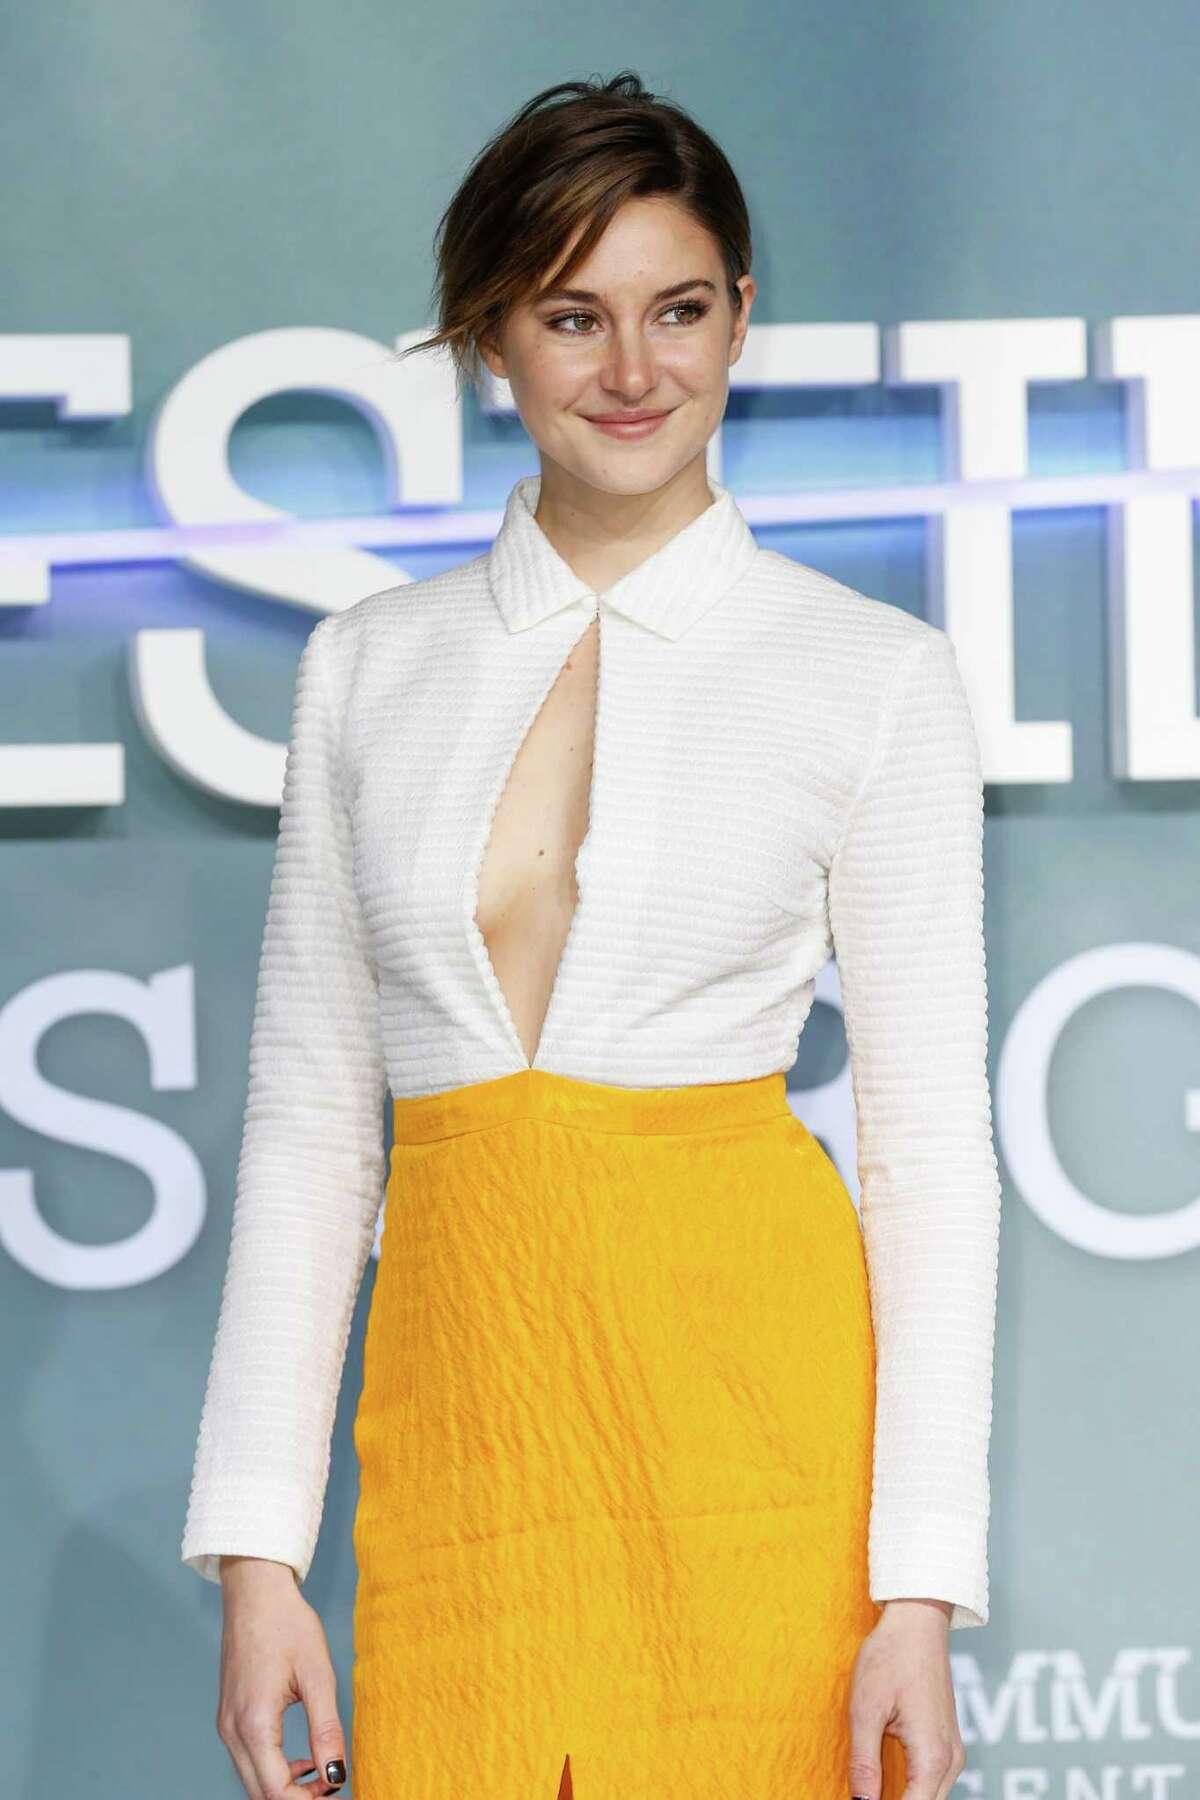 Shailene Woodley attends the 'Die Bestimmung - Insurgent' German Premiere on March 13, 2015 in Berlin, Germany.